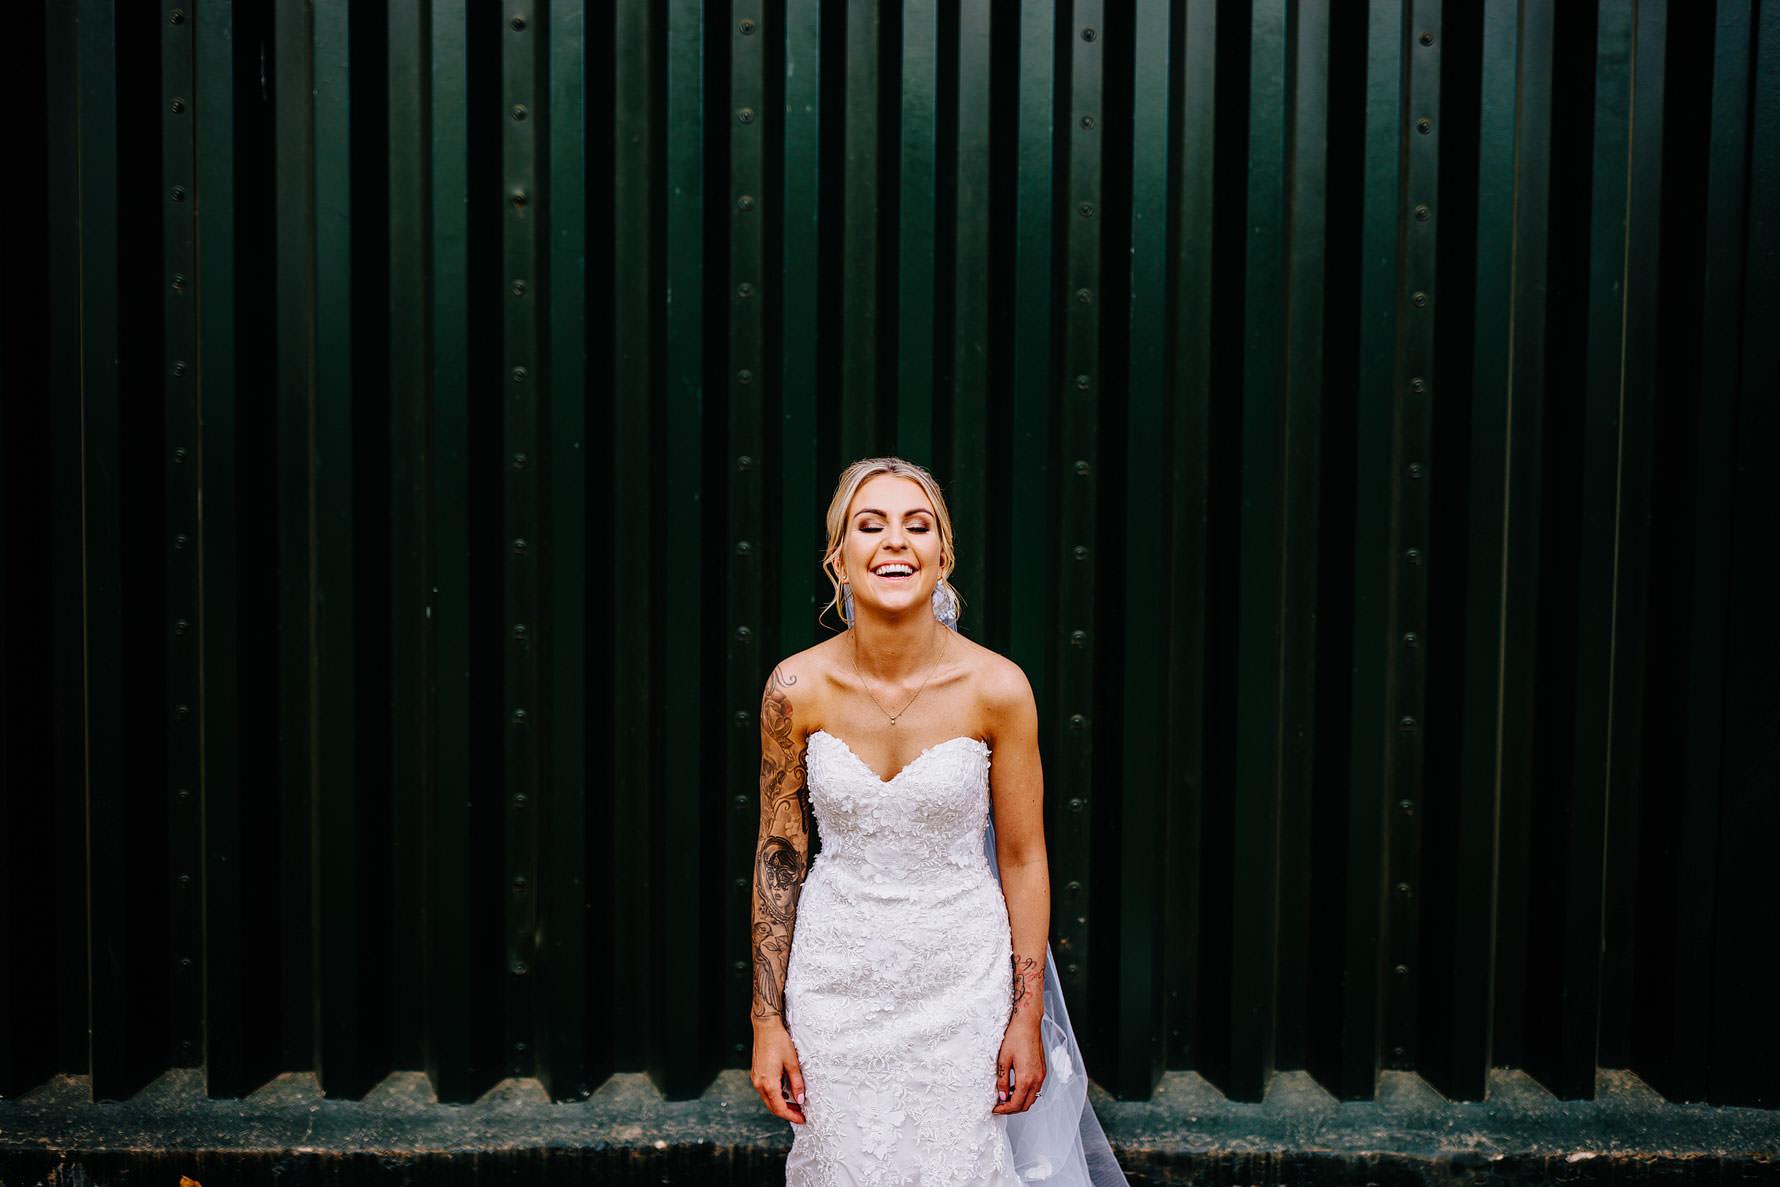 a bridal portrait by Elliot patching